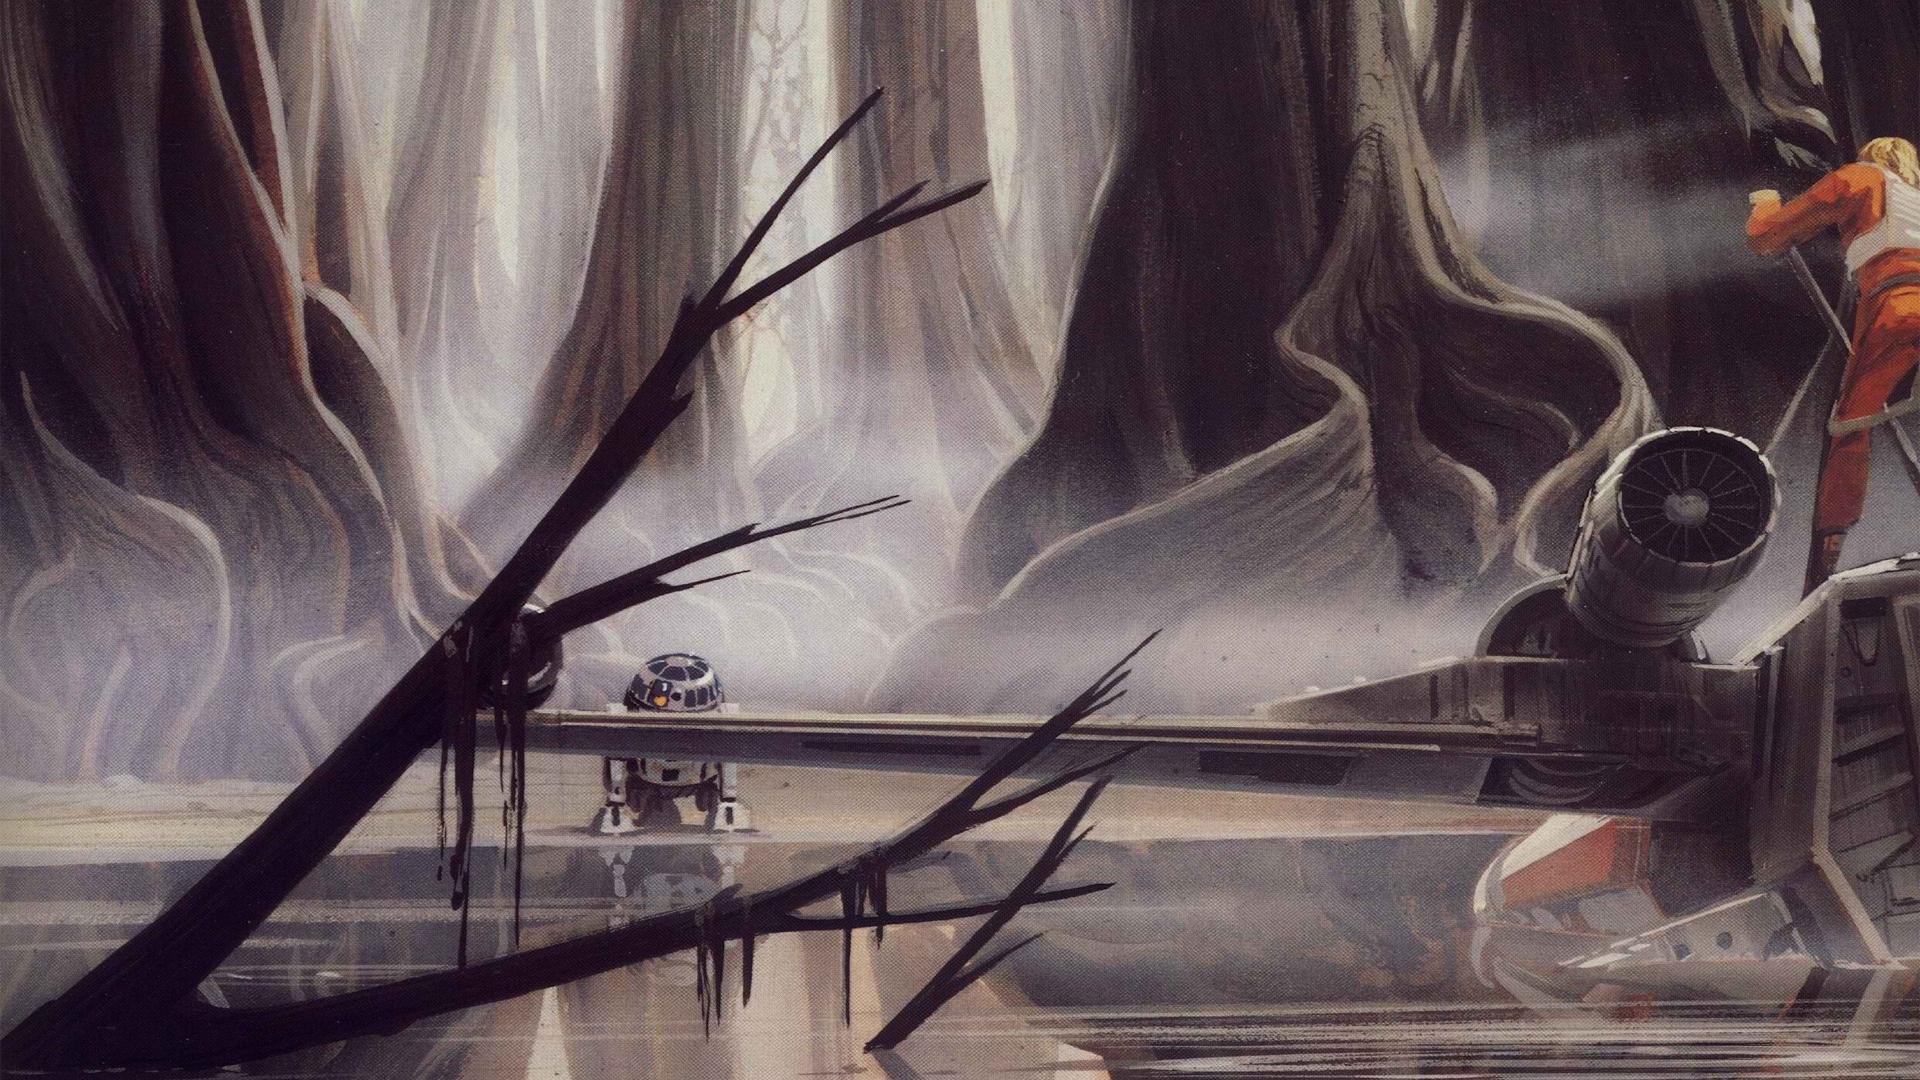 Original Star Wars Concept Art Hd 2497609 Hd Wallpaper Backgrounds Download